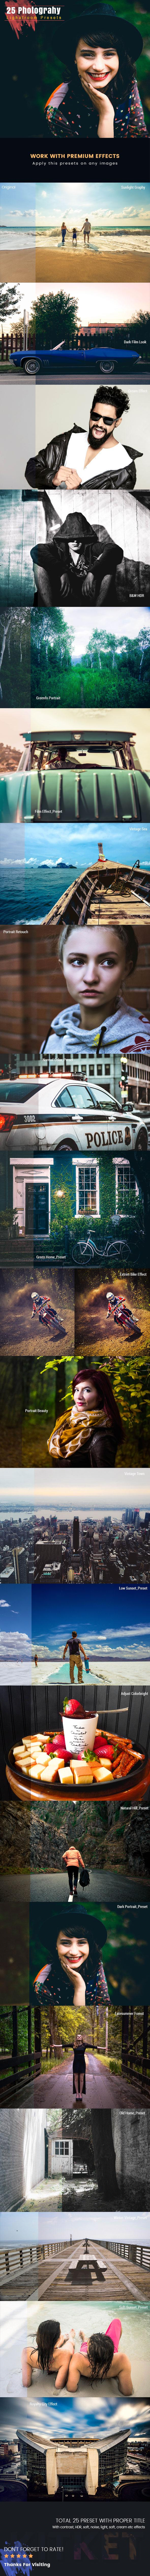 25 Photograhy Presets - Film Lightroom Presets